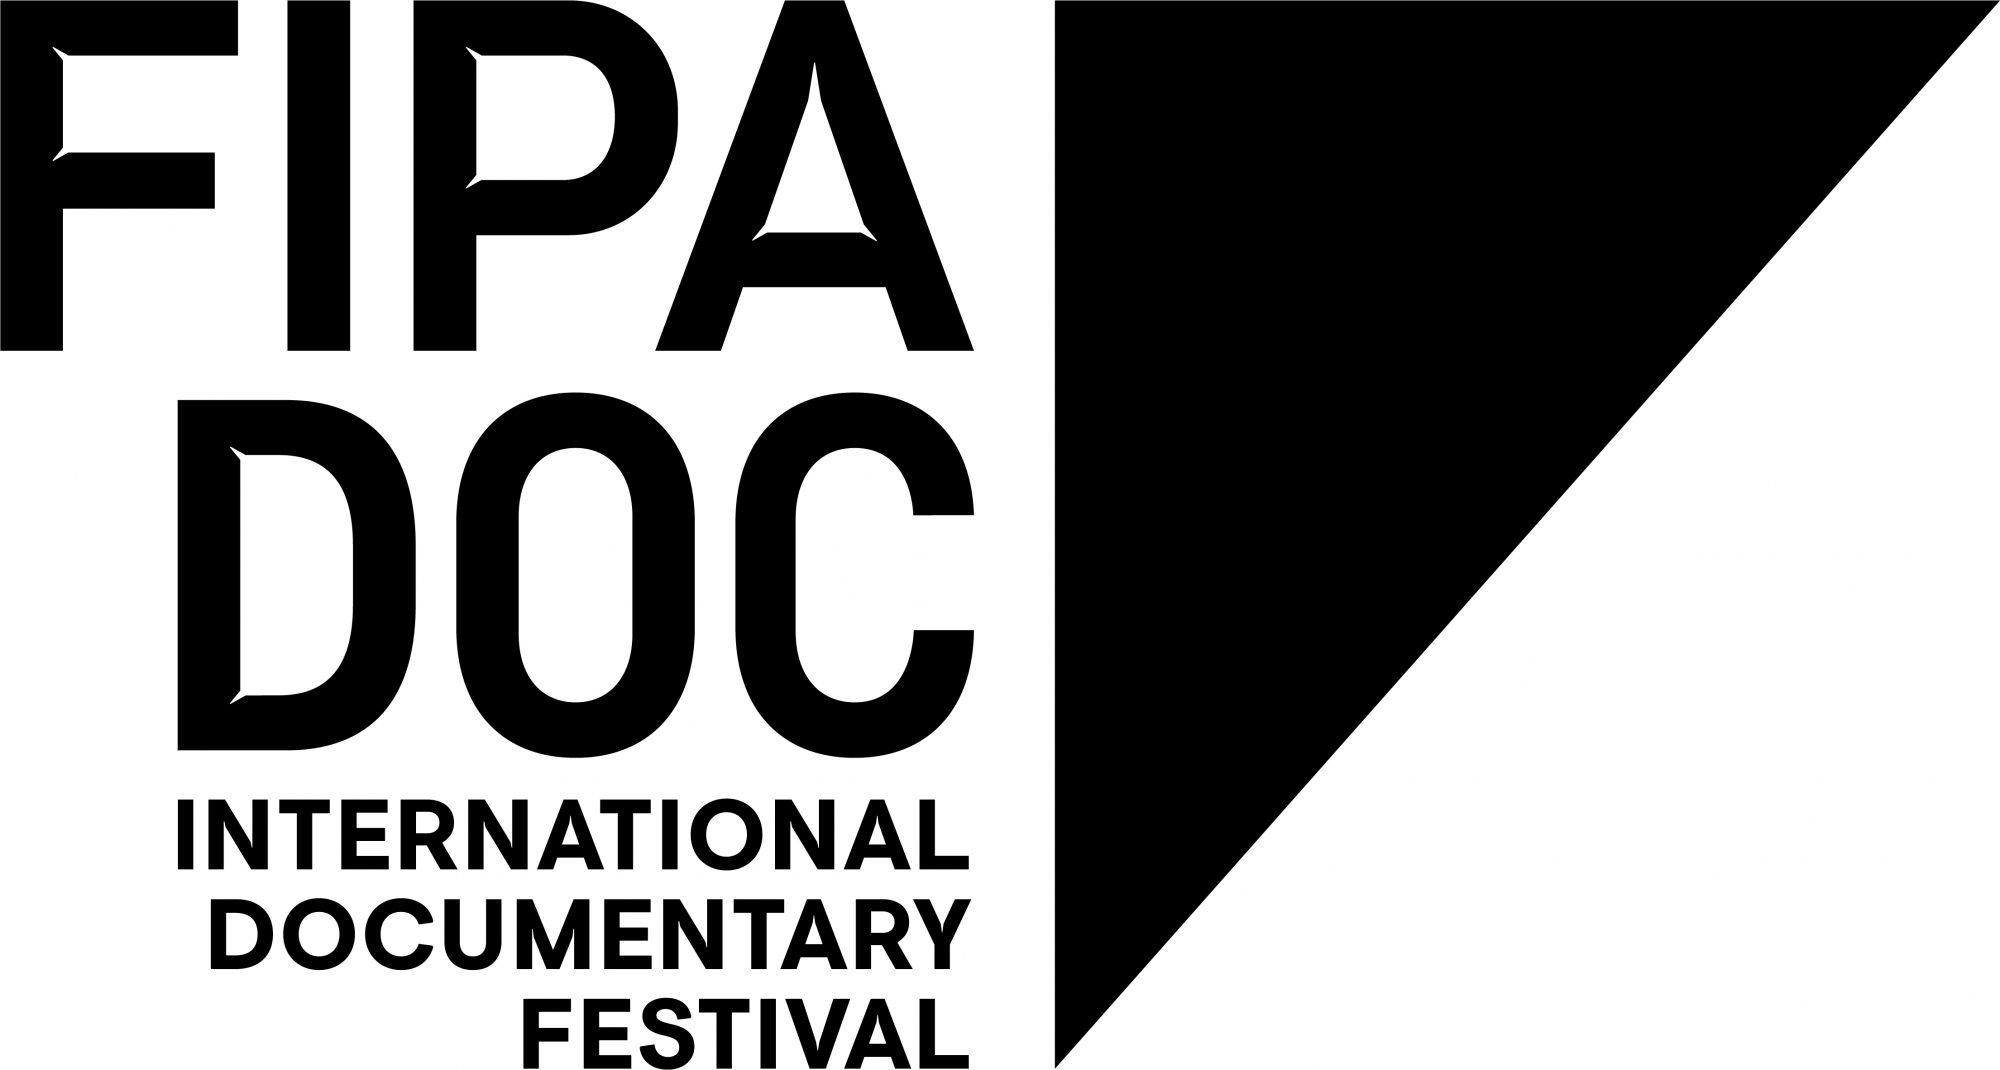 FIPADOC-2019-logo